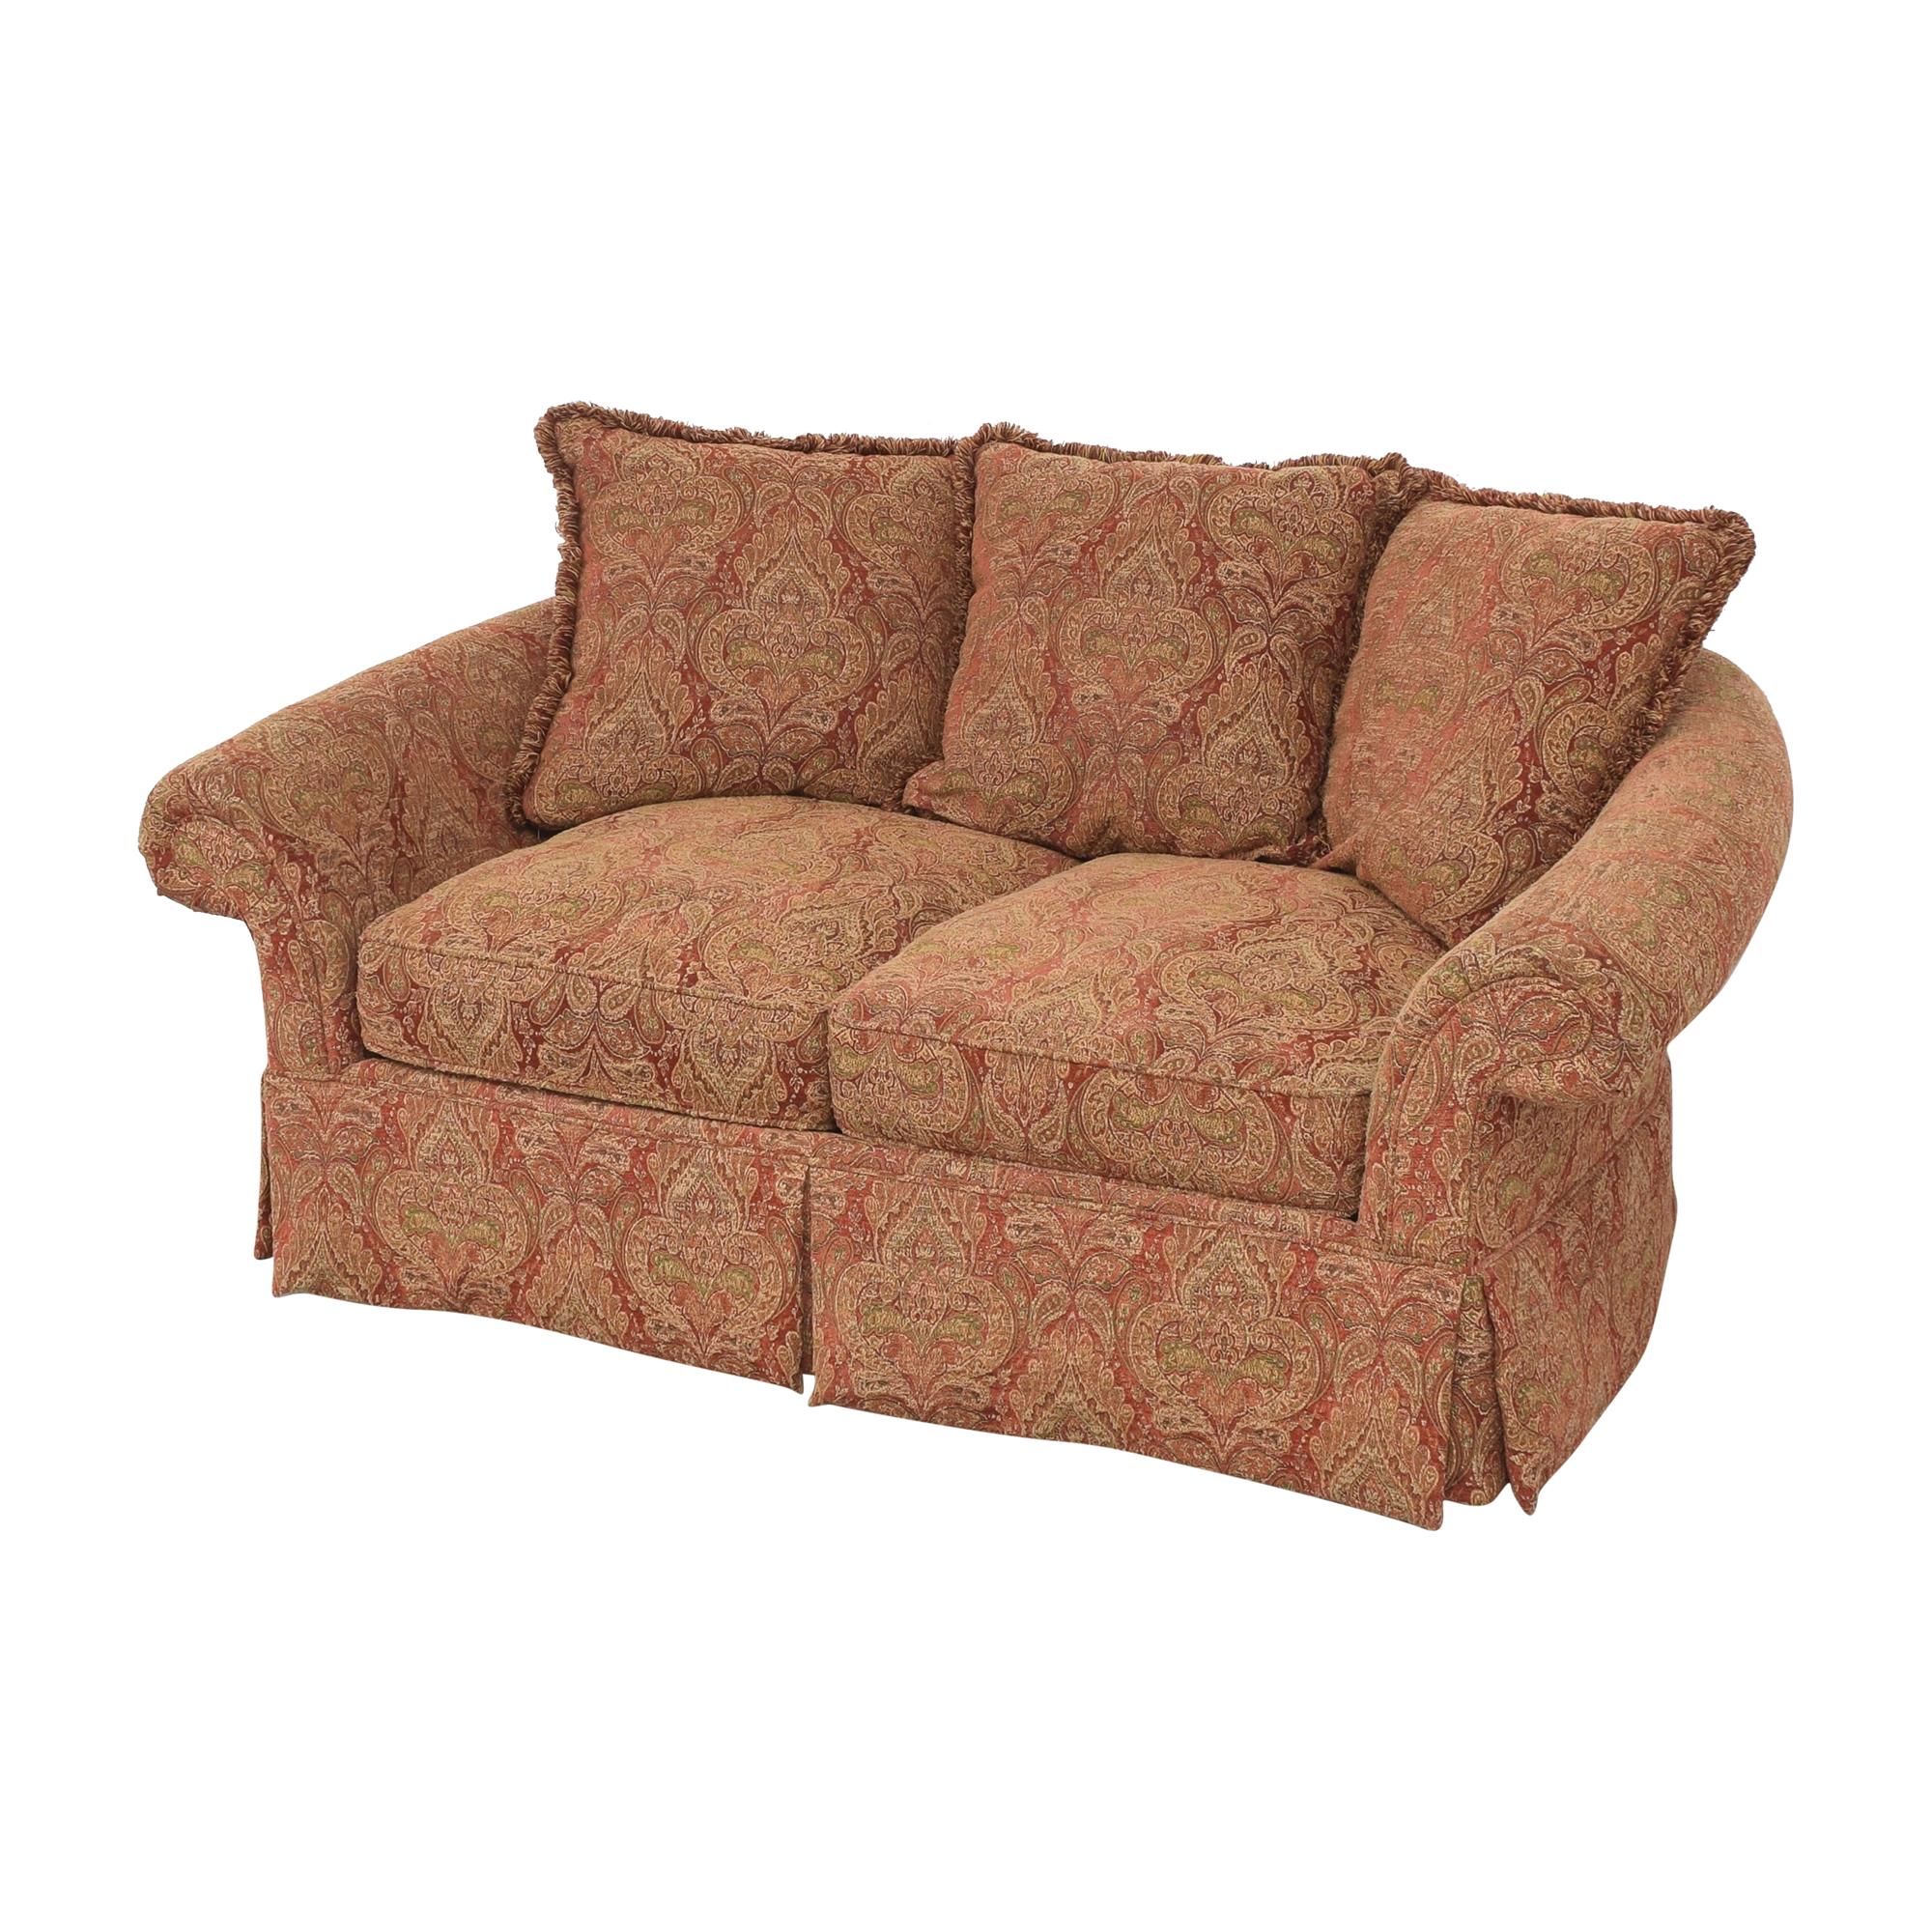 Raymour & Flanigan Raymour & Flanigan Two Cushion Skirted Sofa for sale